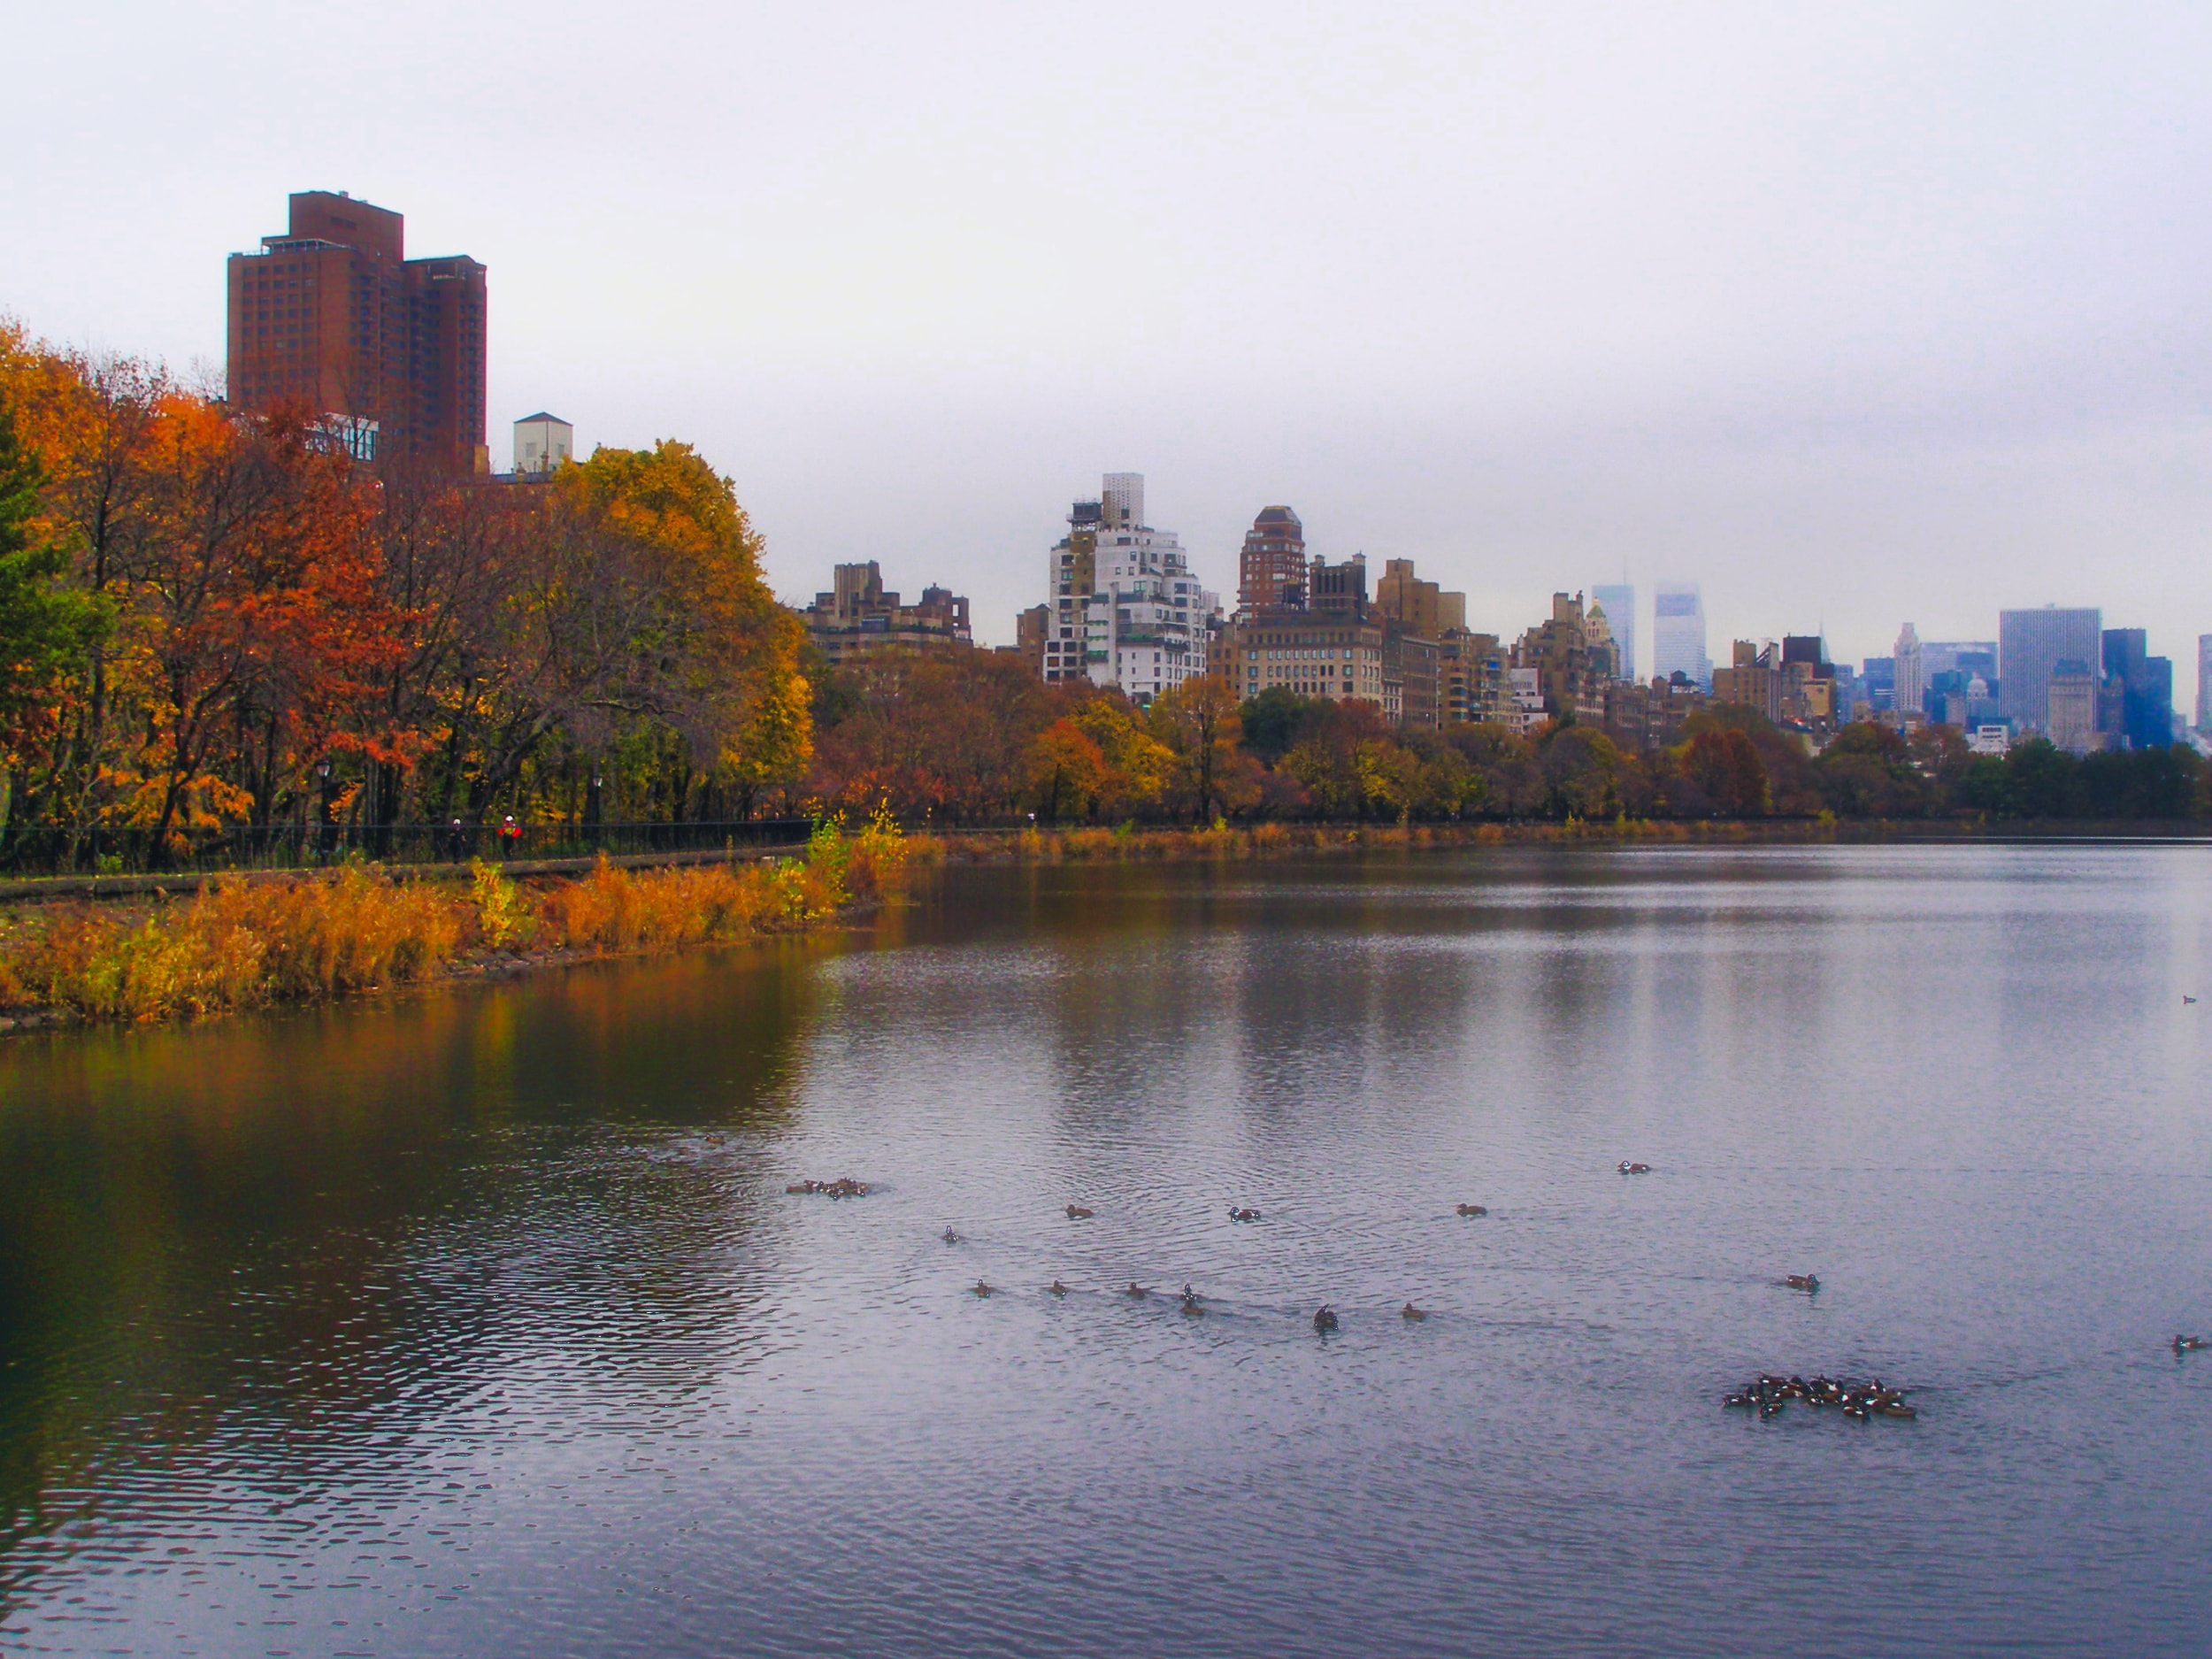 Jackie Kennedy Onasis Resevoir-Manhatten-New York-USA-wmlamont-min.jpg